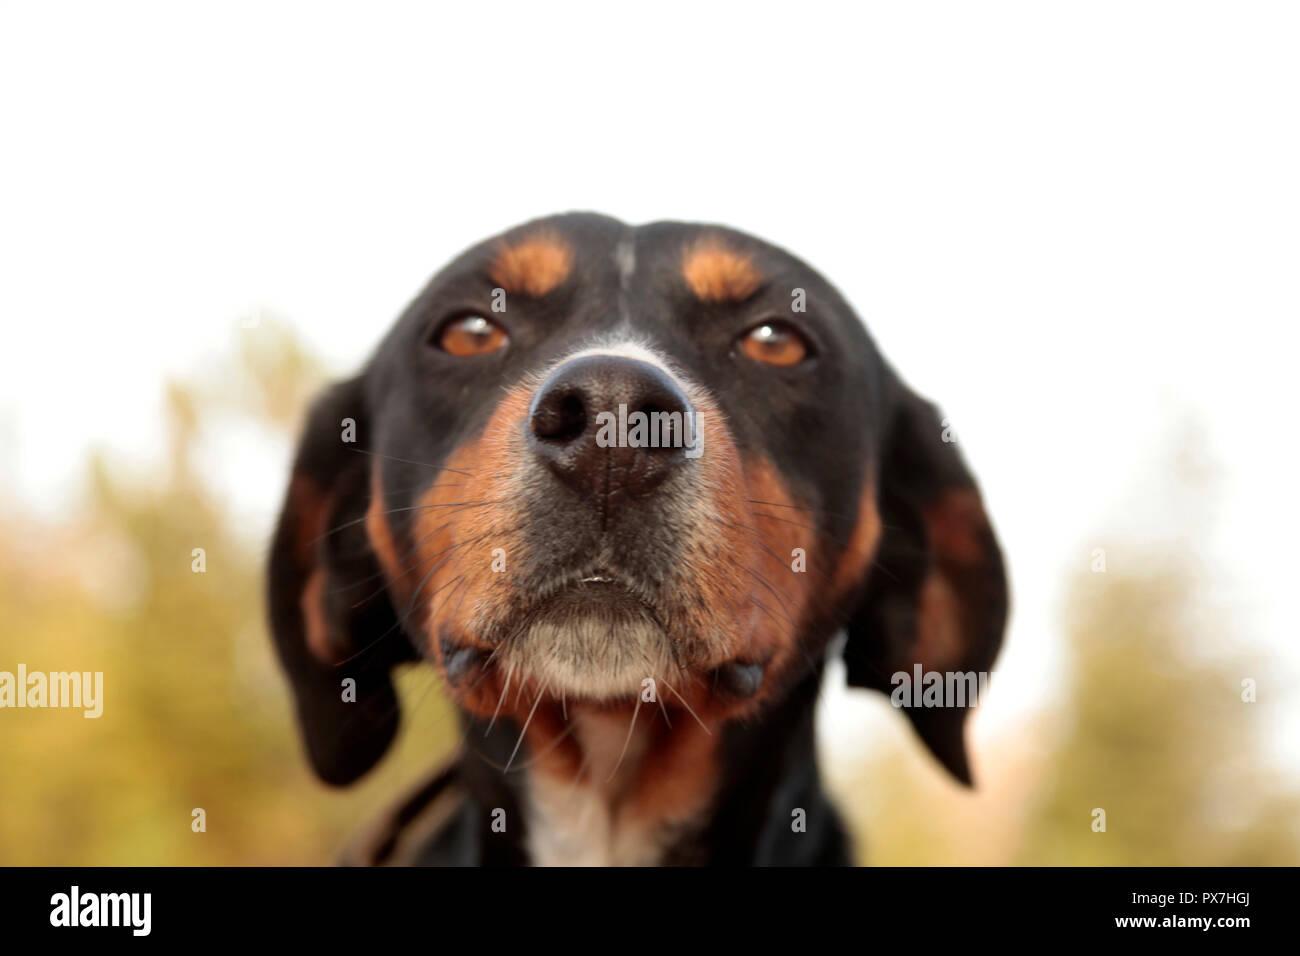 Portrait of a greyhound dog - Stock Image